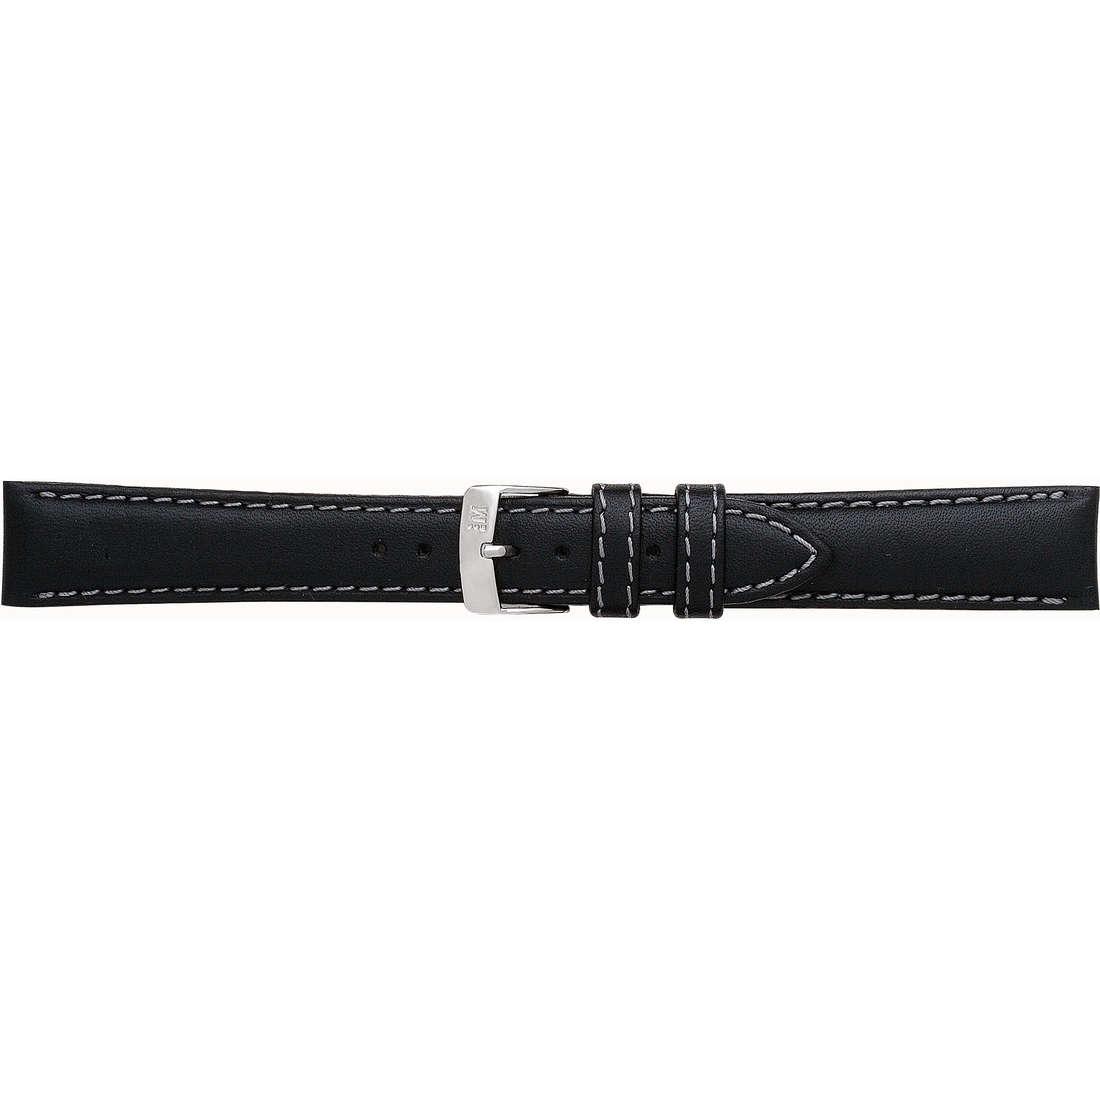 watch watch bands watch straps man Morellato Linea Sport A01X2785237019CR18